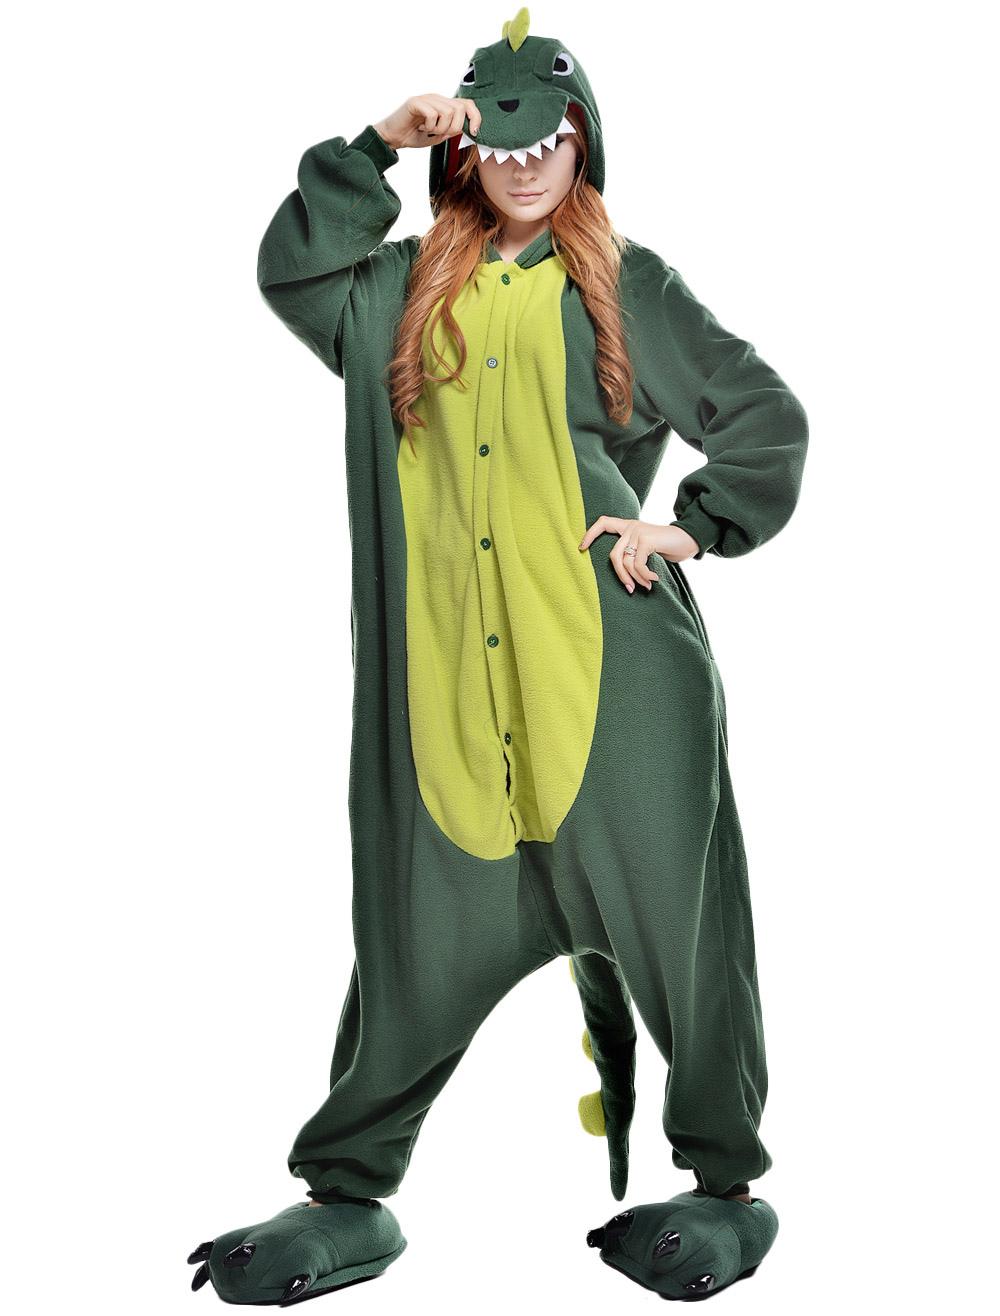 Pijama Kigurumi Dinosaurio Lana Franela Verde Animal Traje de  Halloween-No.1 ... 33a2740f3986